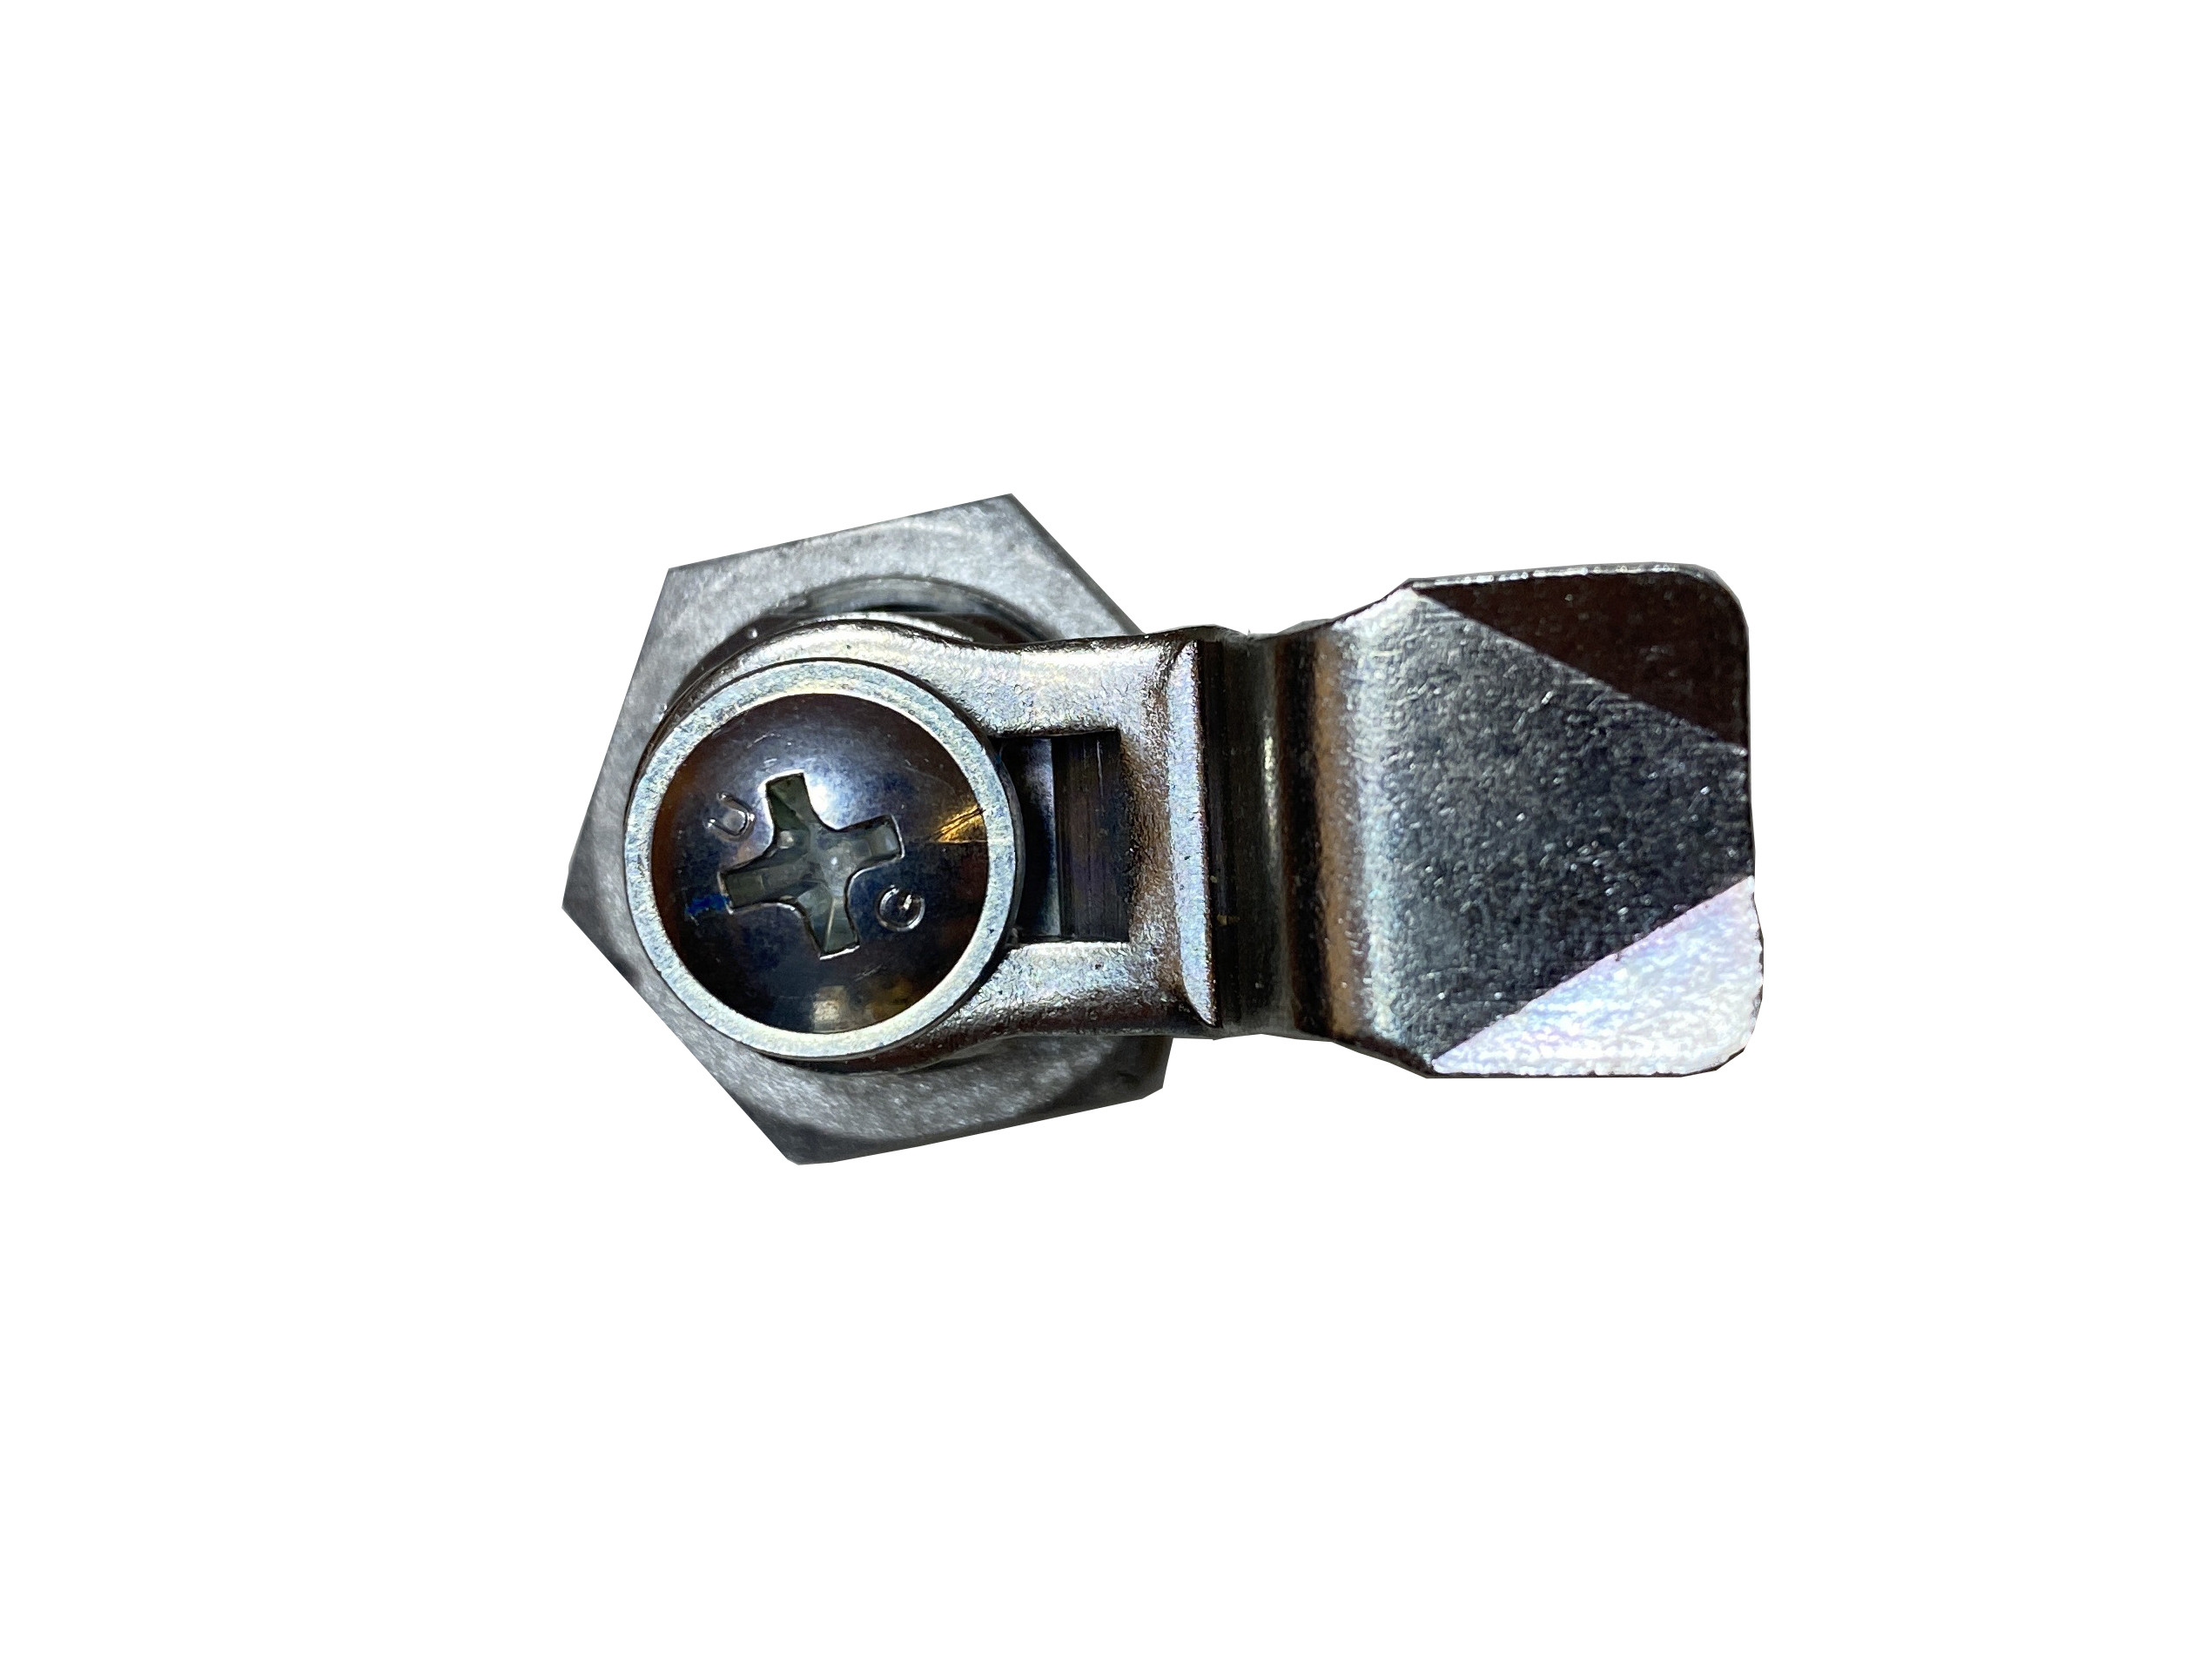 P503 náhradní zámek ke skříni